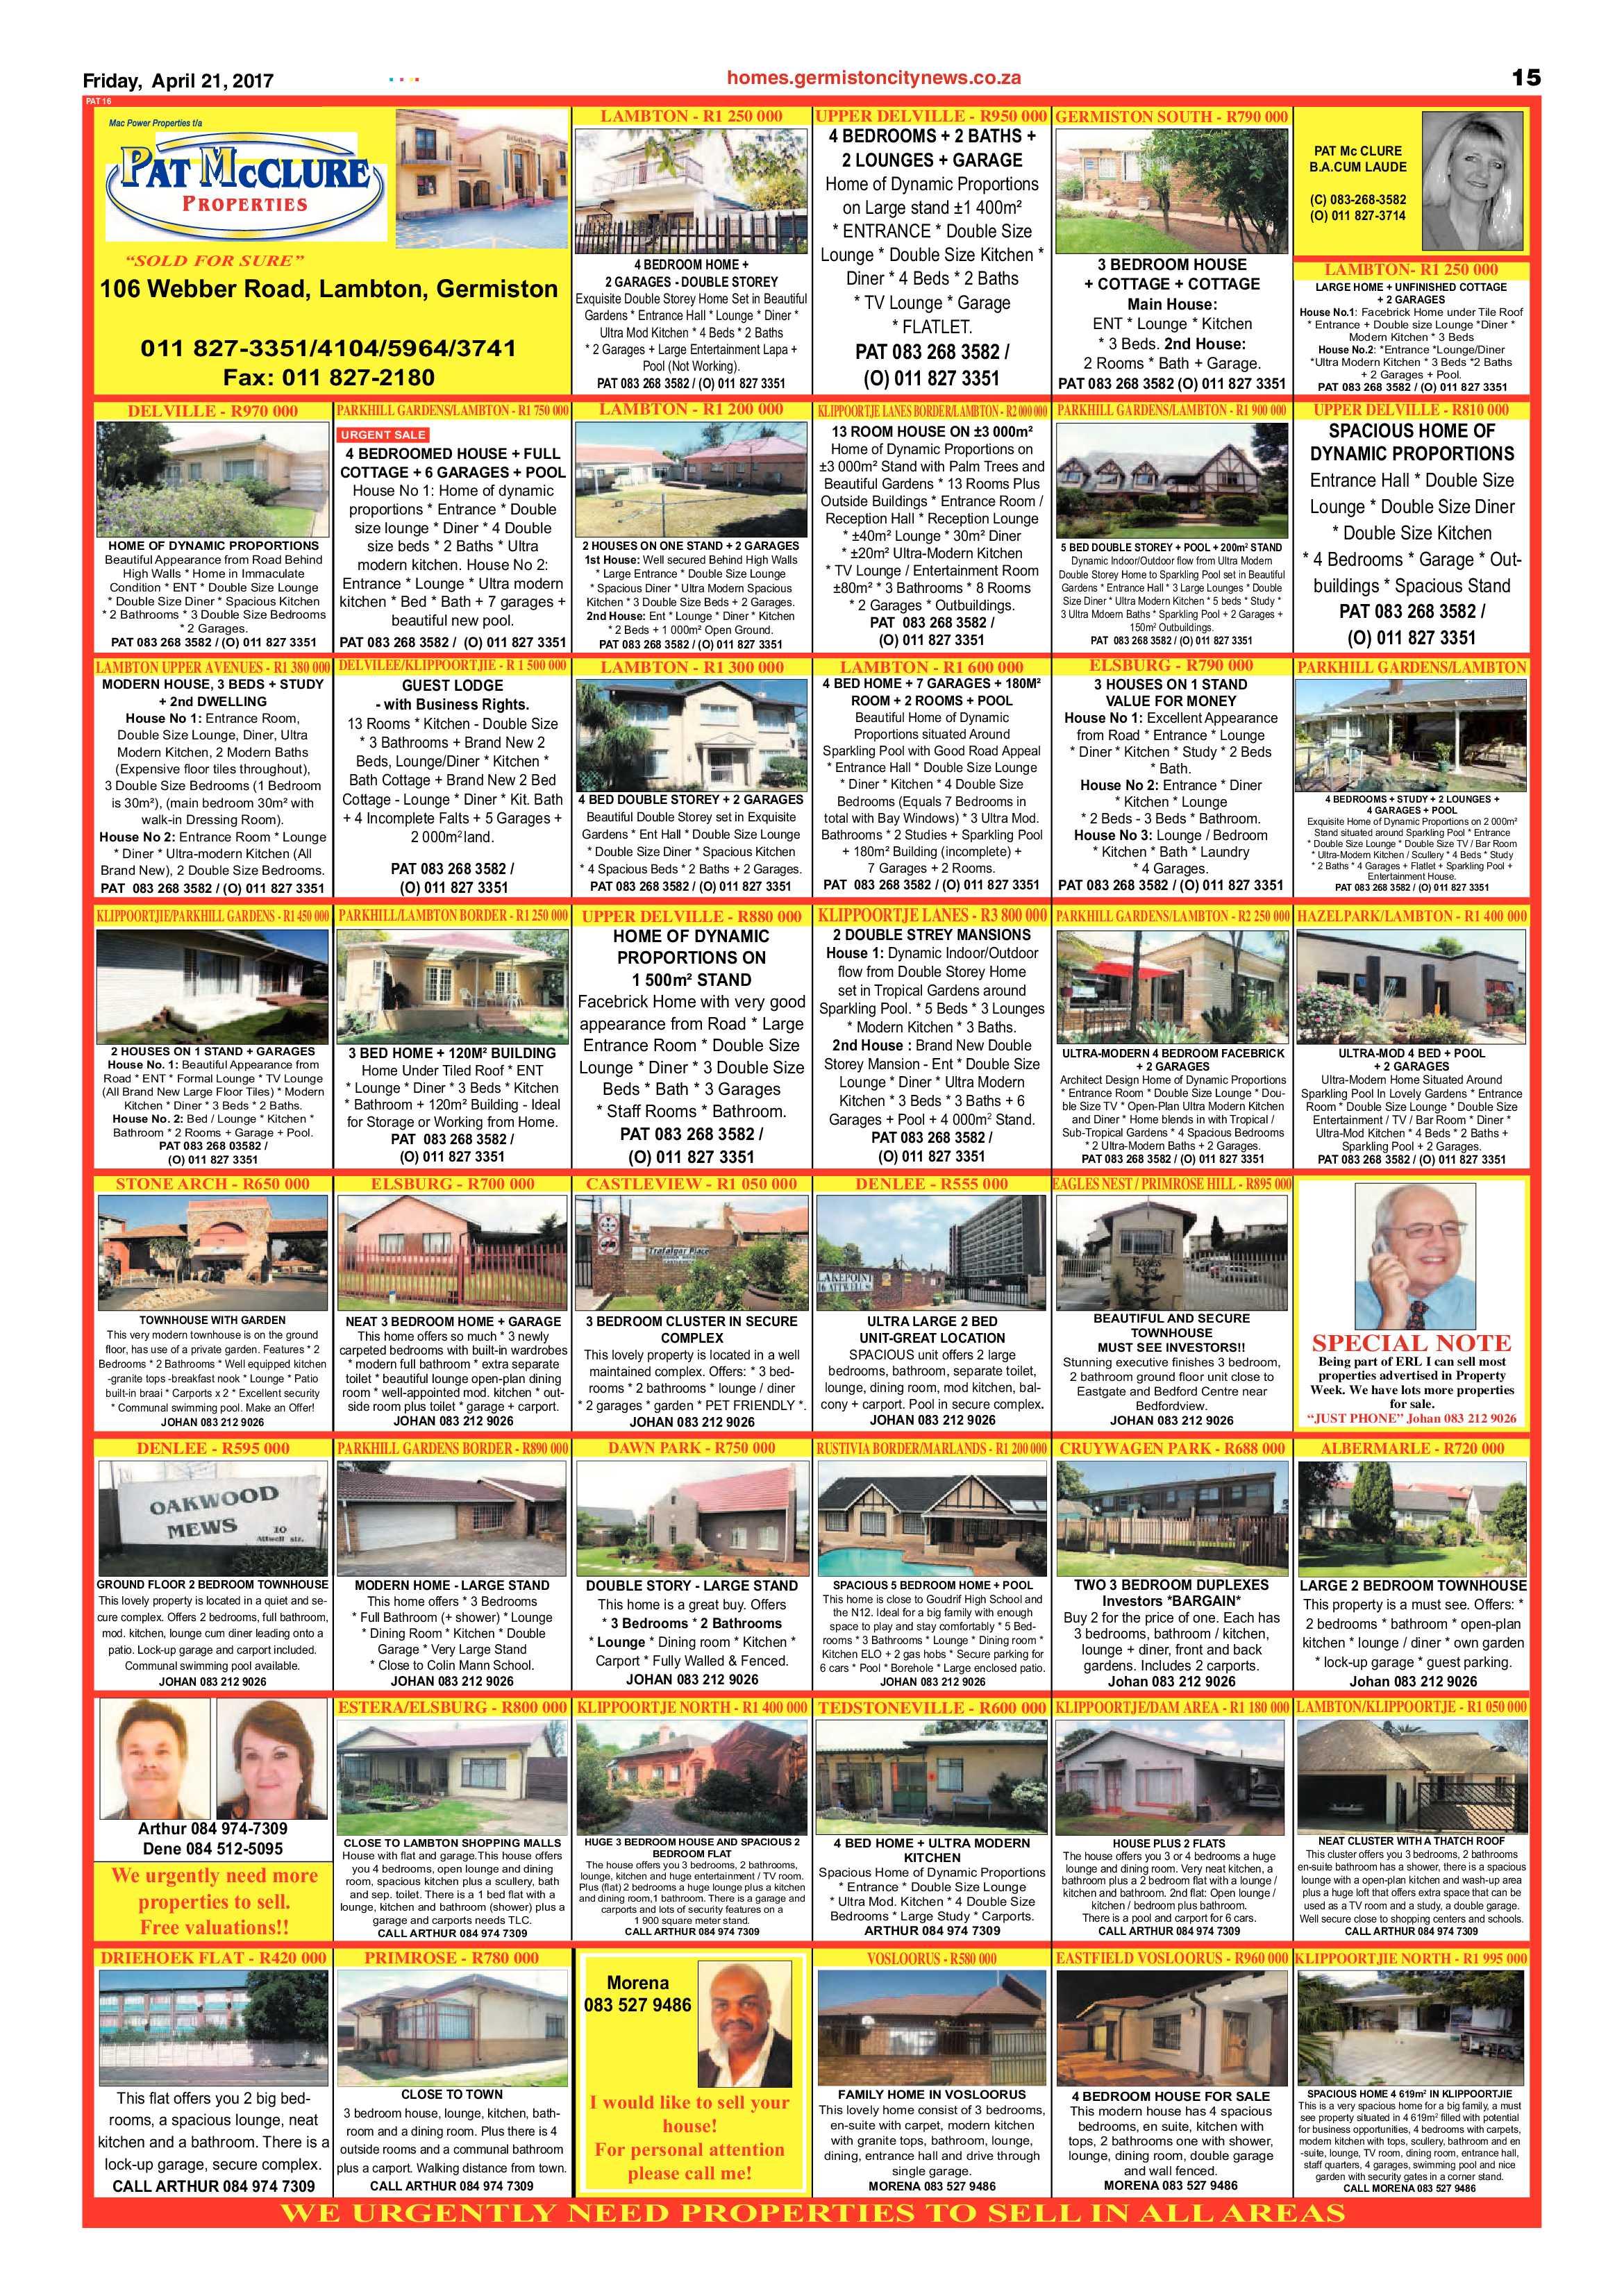 germiston-city-news-19-april-2017-epapers-page-15